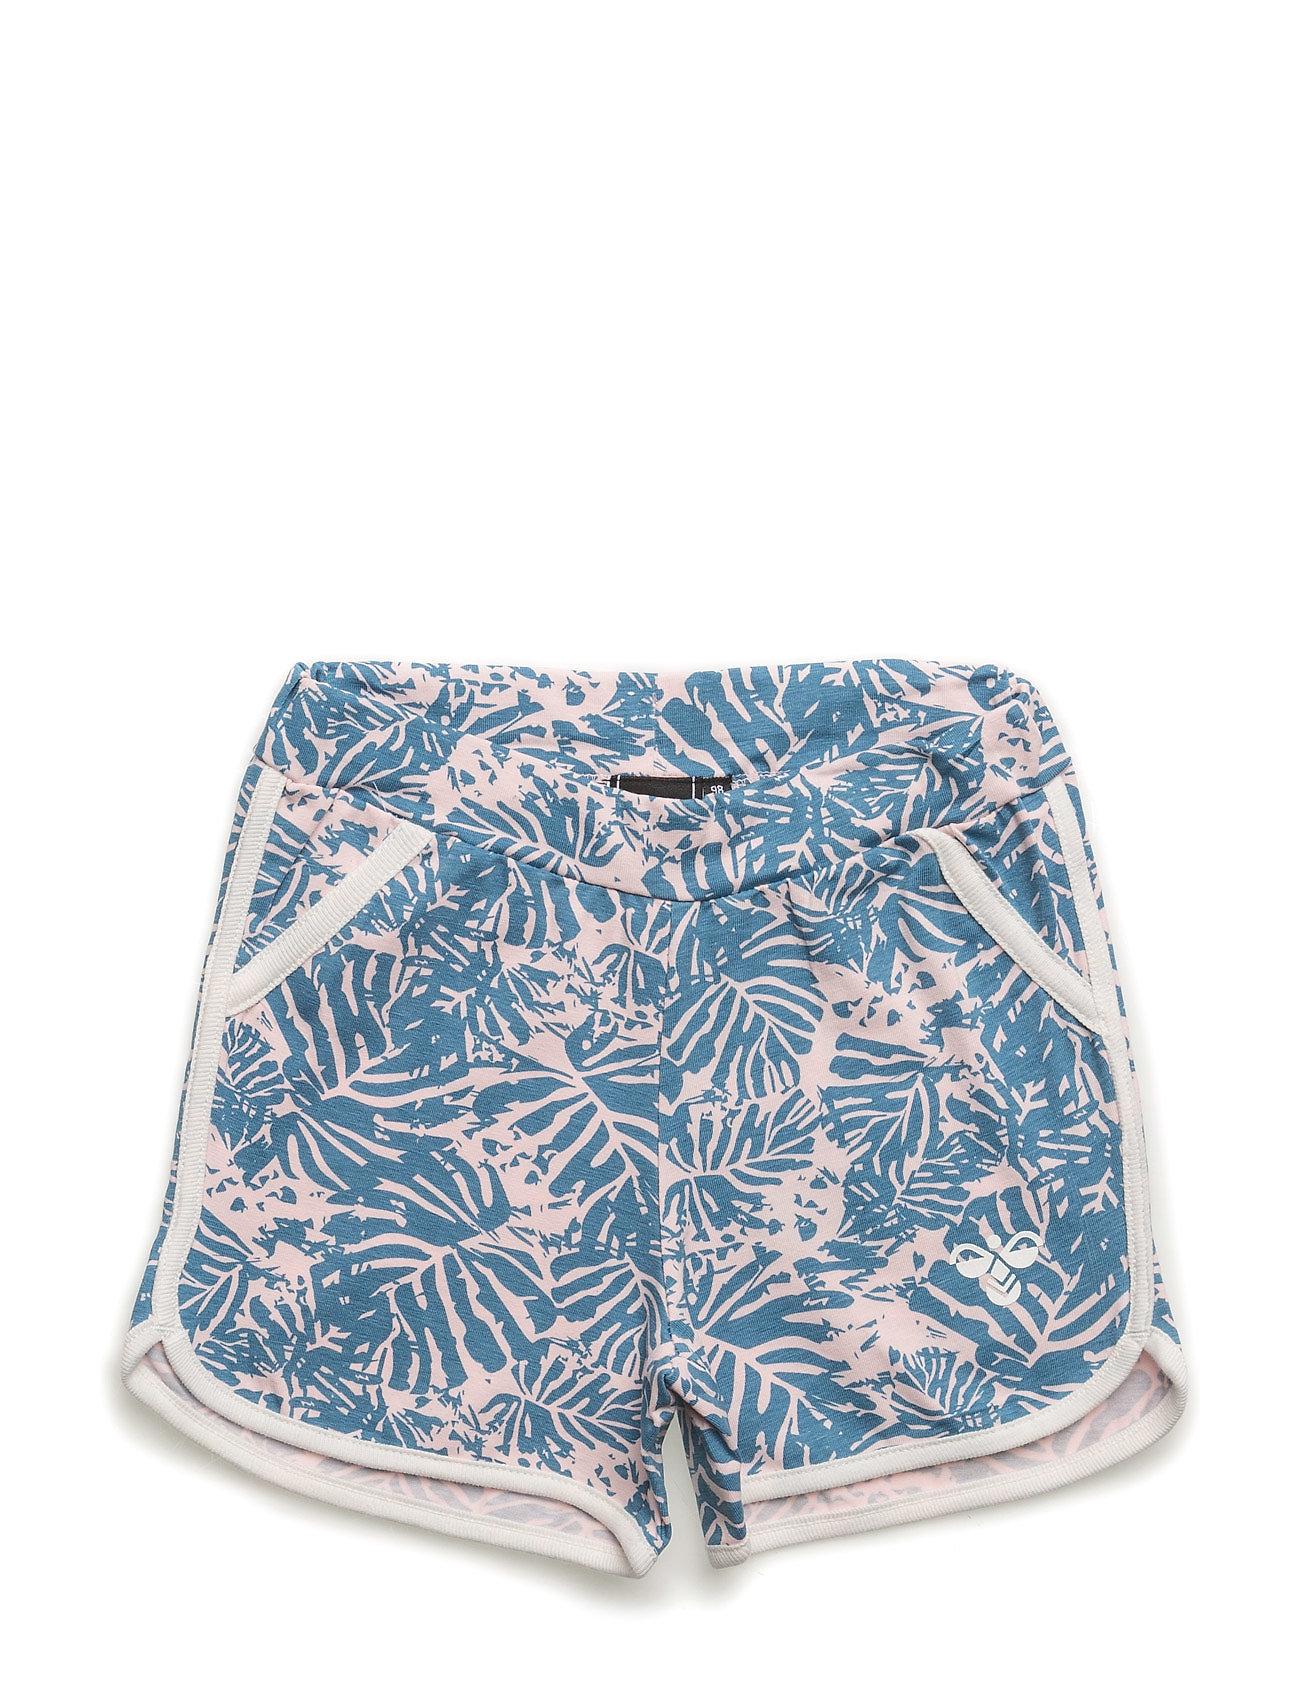 Gabby Shorts Ss17 Hummel Shorts til Piger i